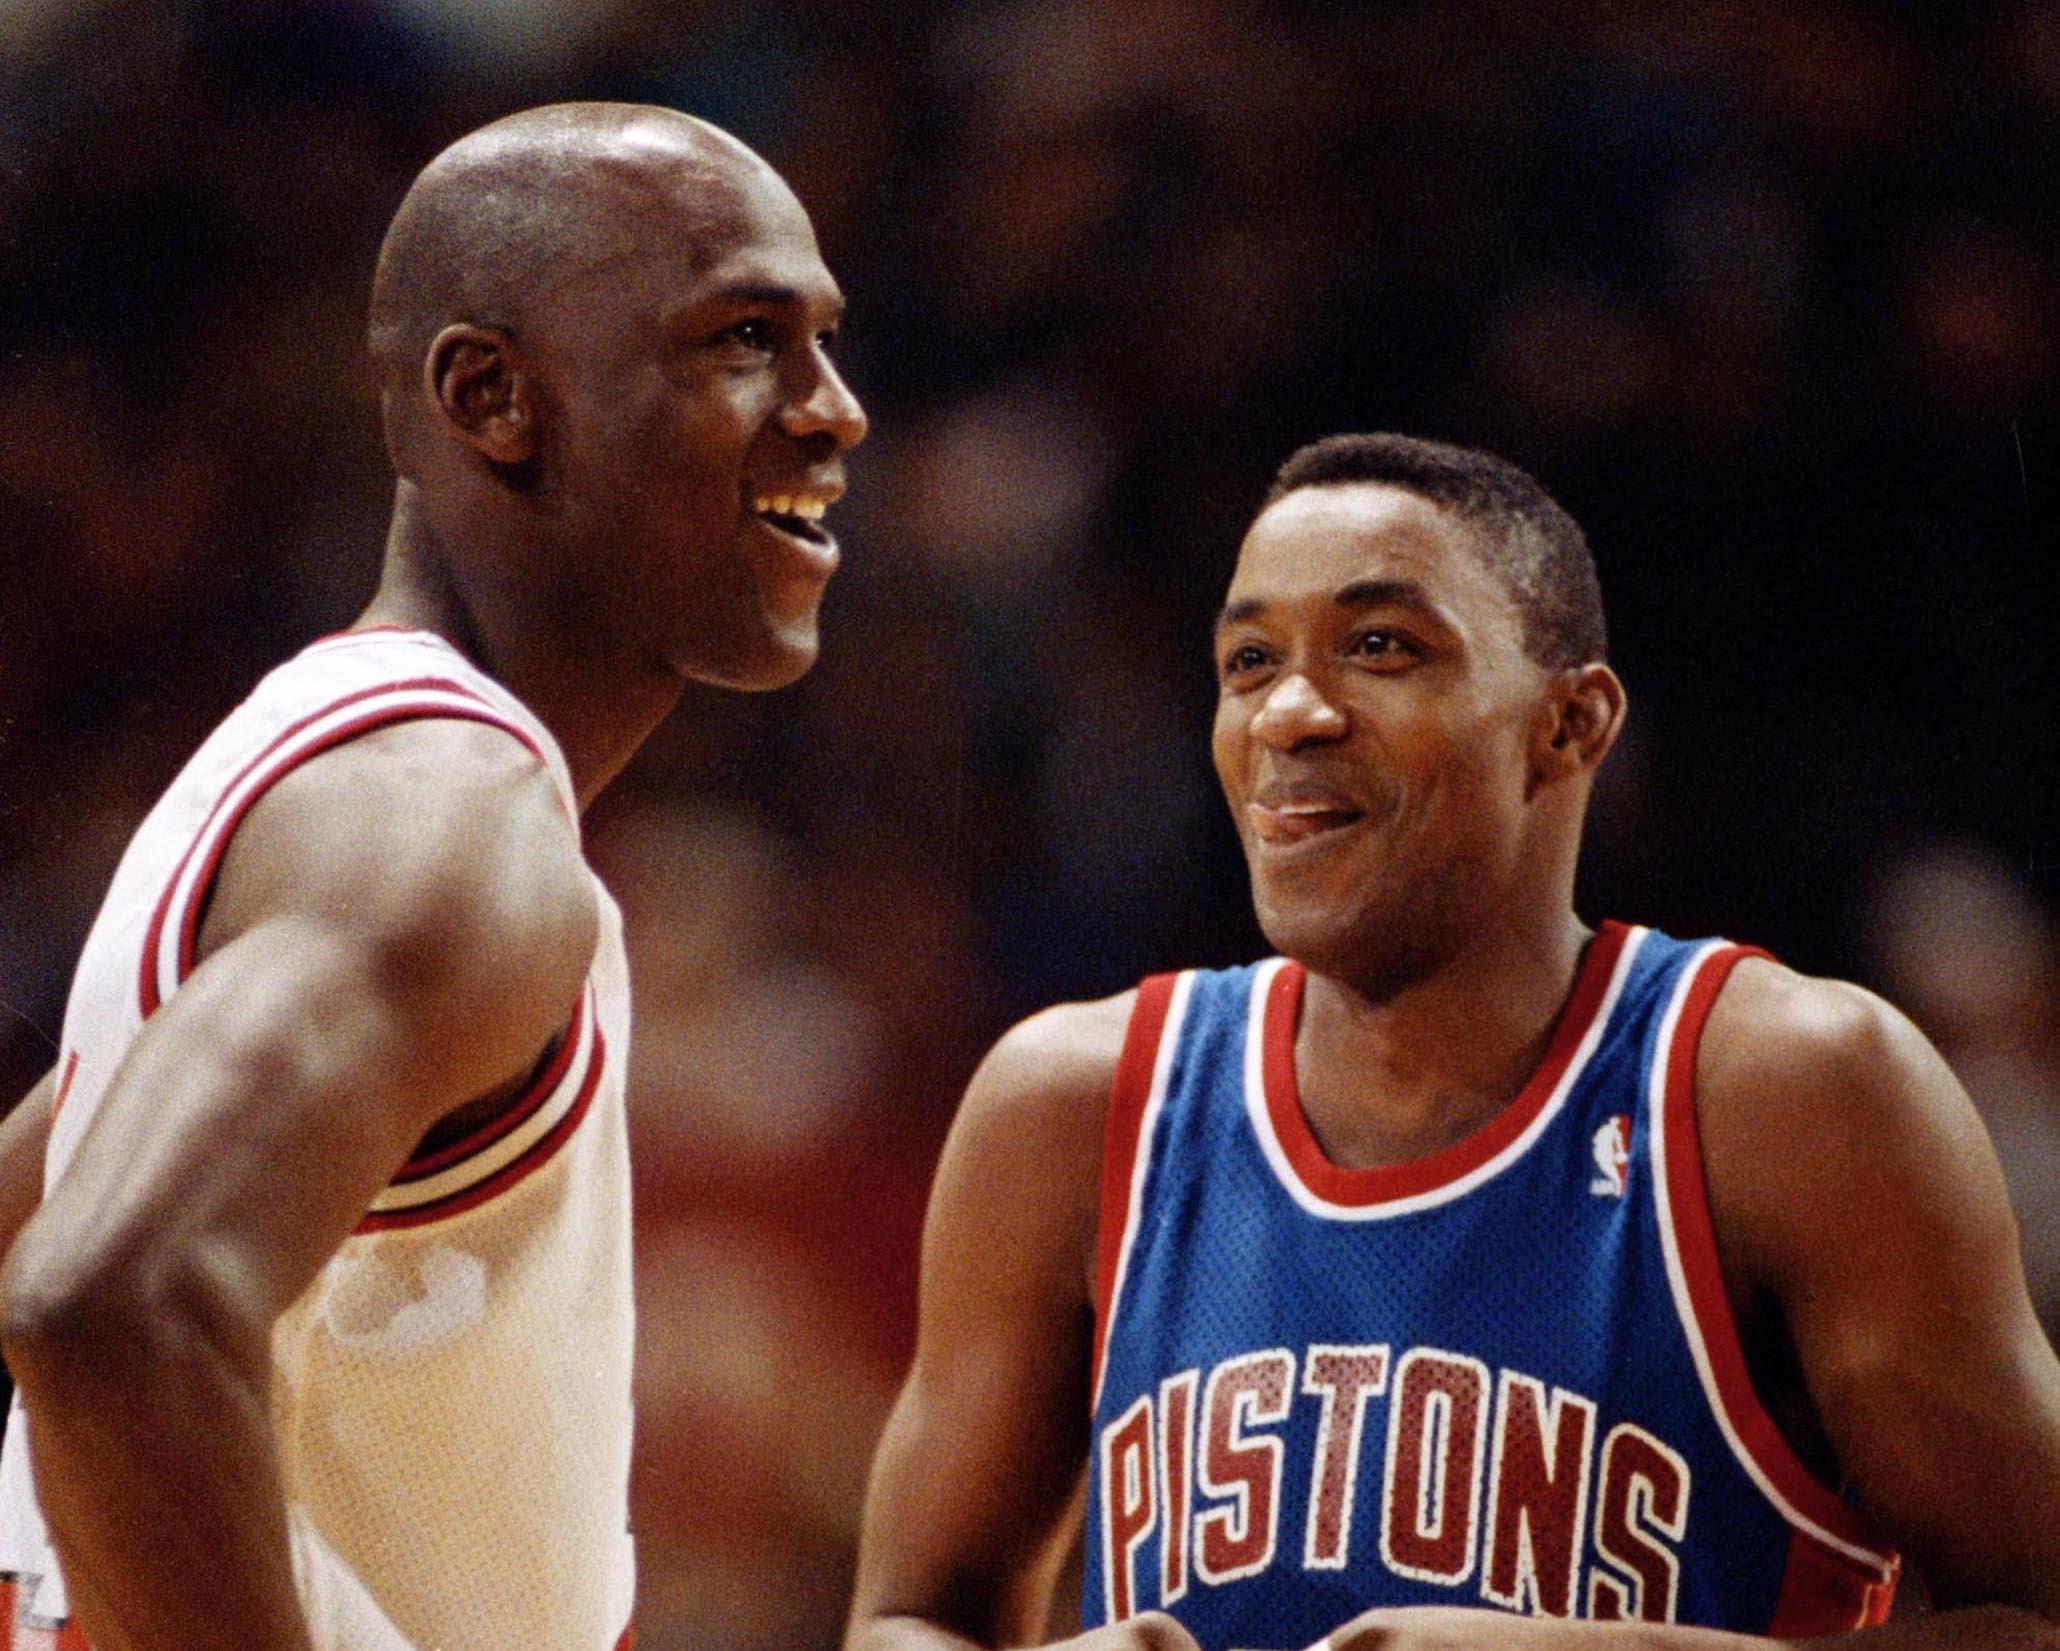 SOURCE SPORTS: Audio Surfaces Confirming Michael Jordan Didn't Want Isiah Thomas On the 92 Dream Team